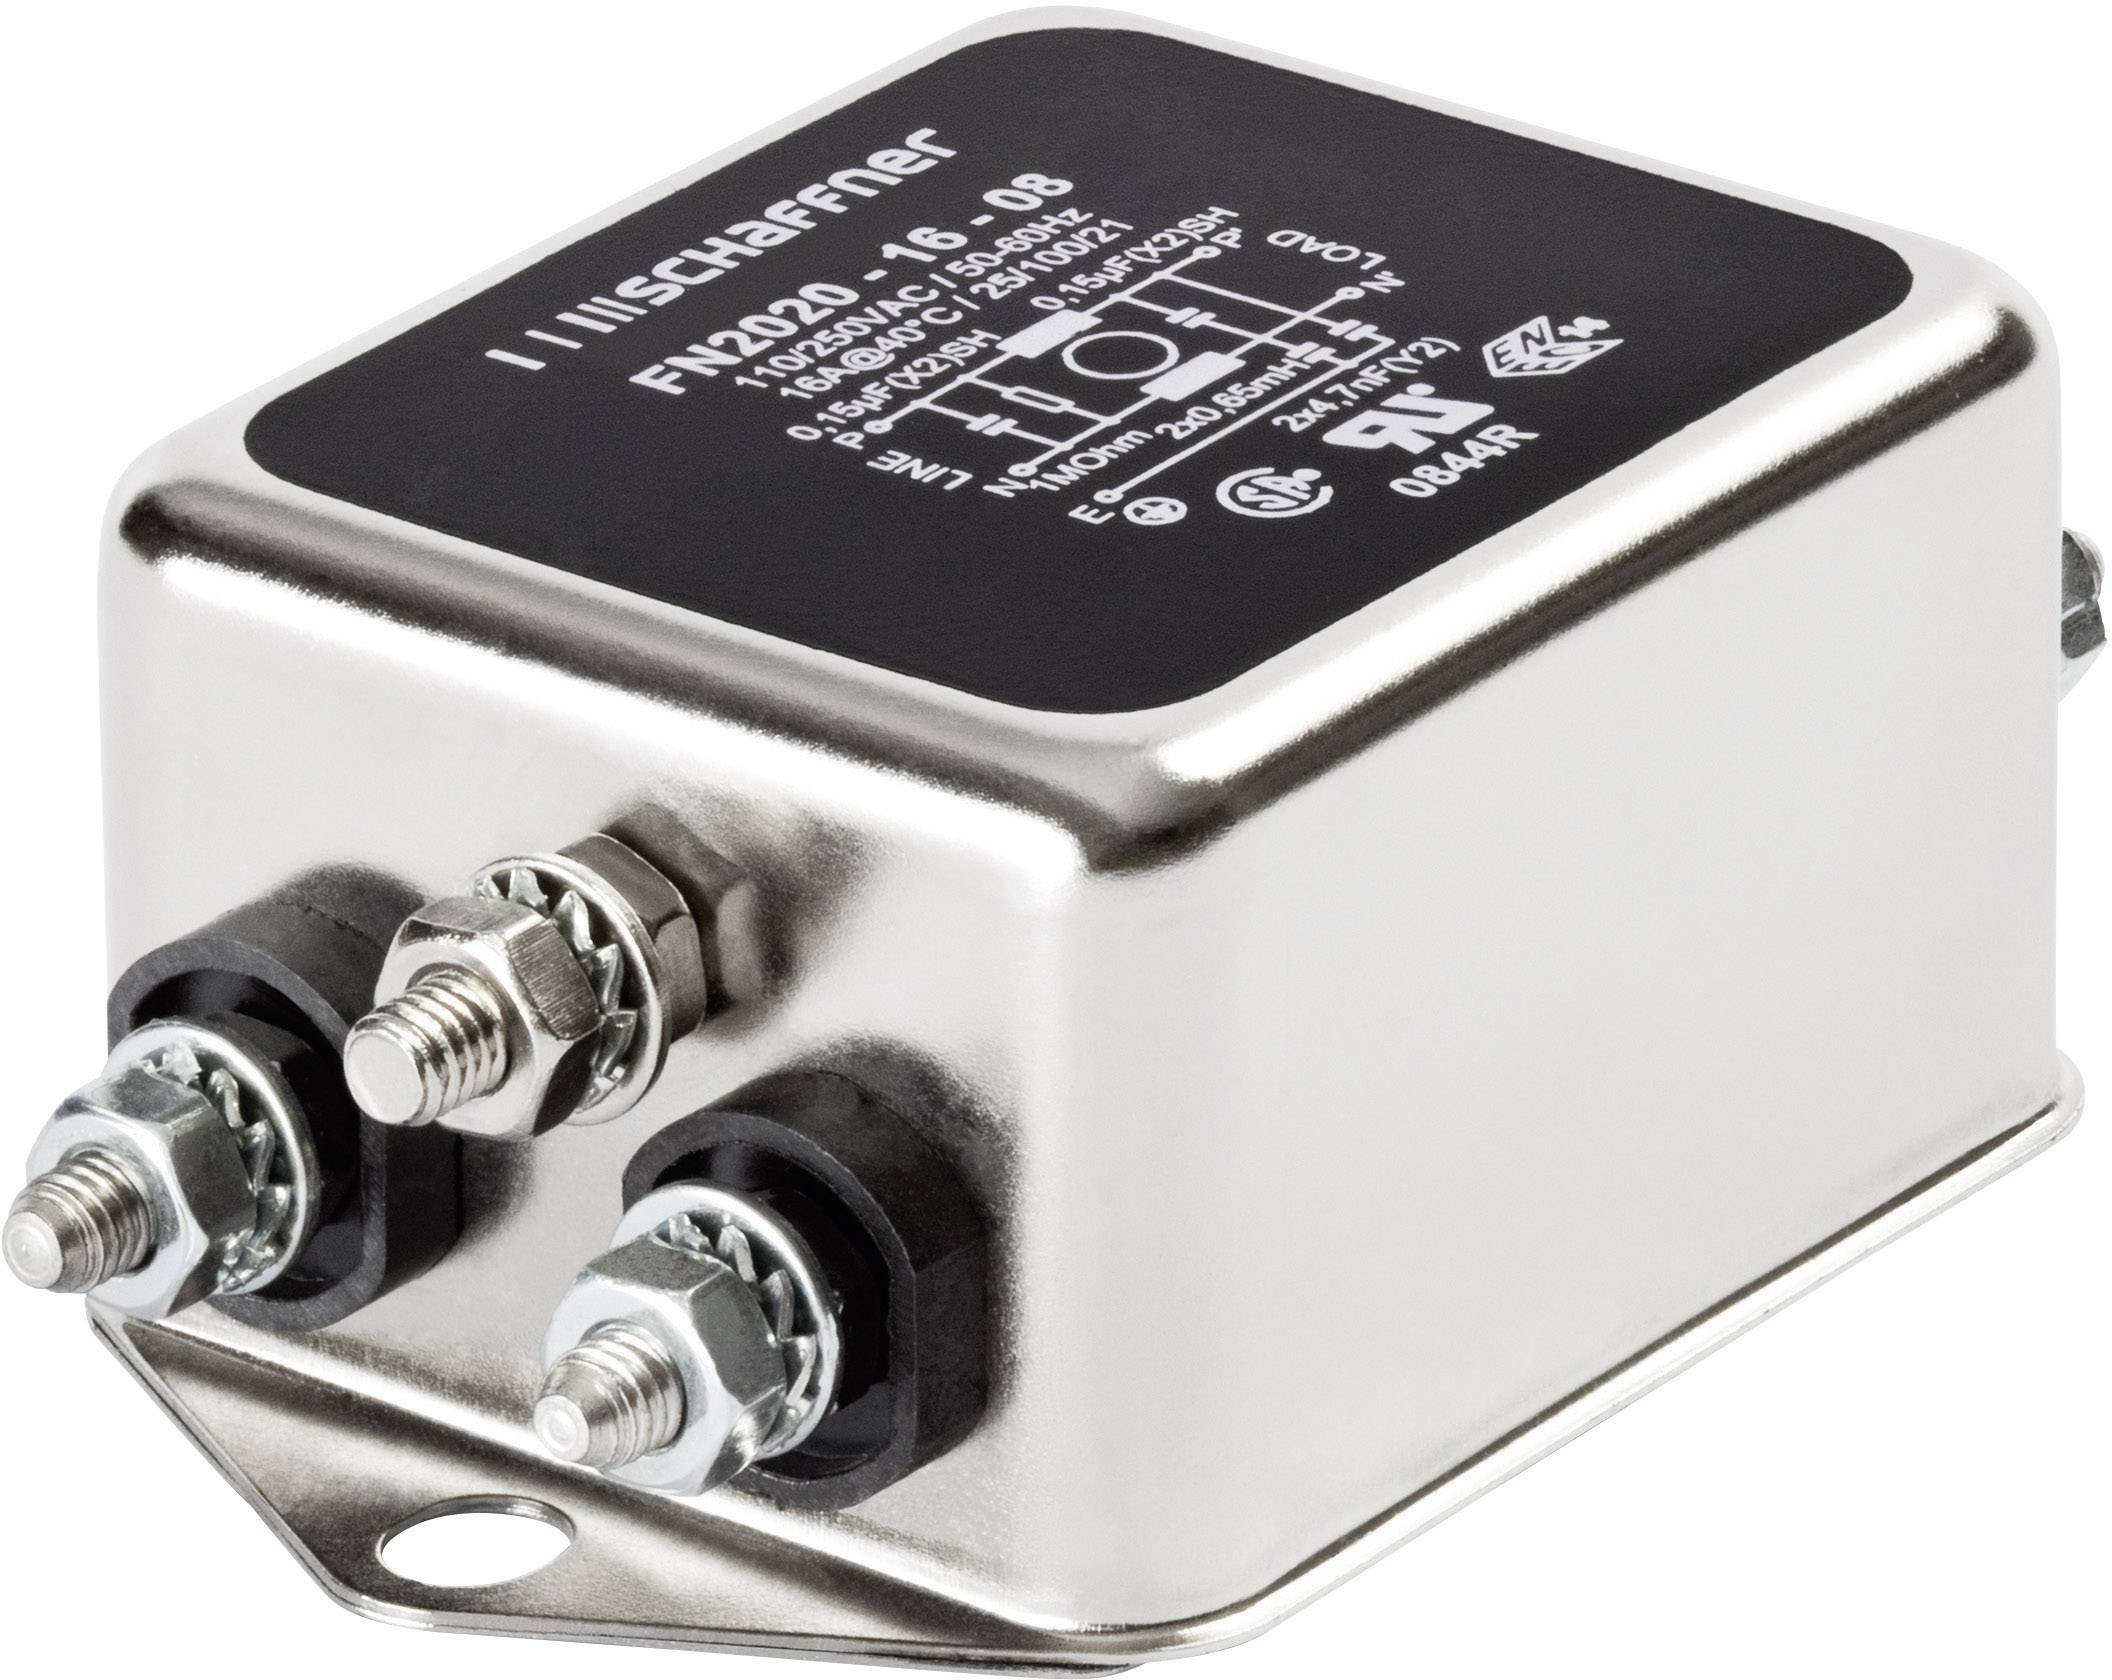 Odrušovací filter Schaffner FN 2020-12-06 FN 2020-12-06, 250 V/AC, 12 A, 0.7 mH, (š x v) 64 mm x 29.3 mm, 1 ks